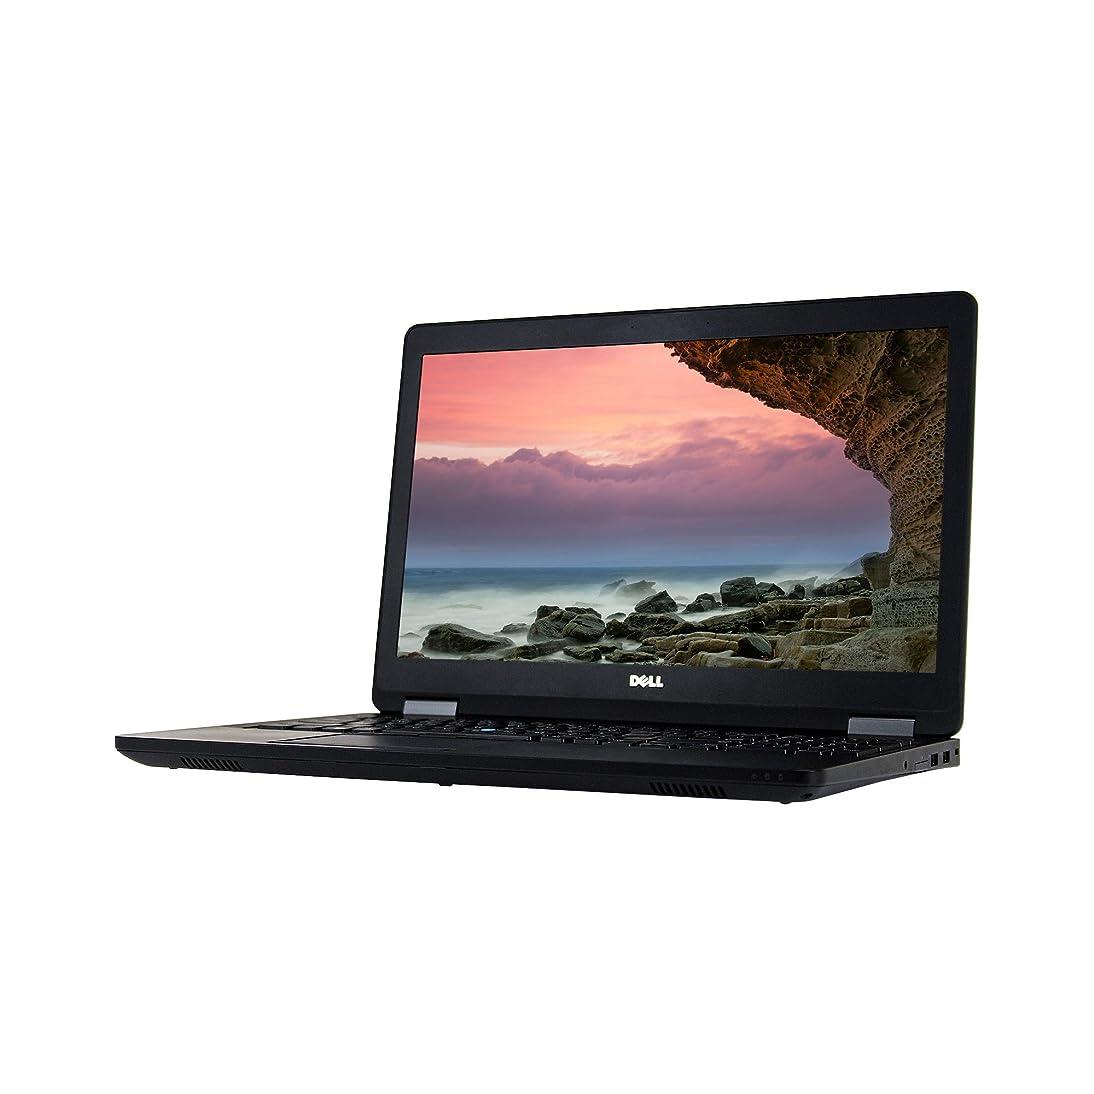 DELL Latitude E5570 15.6in Laptop, Core i5-6300U 2.4GHz, 8GB Ram, 180GB SSD, Windows 10 Pro 64bit (Renewed) xdeh087059884951